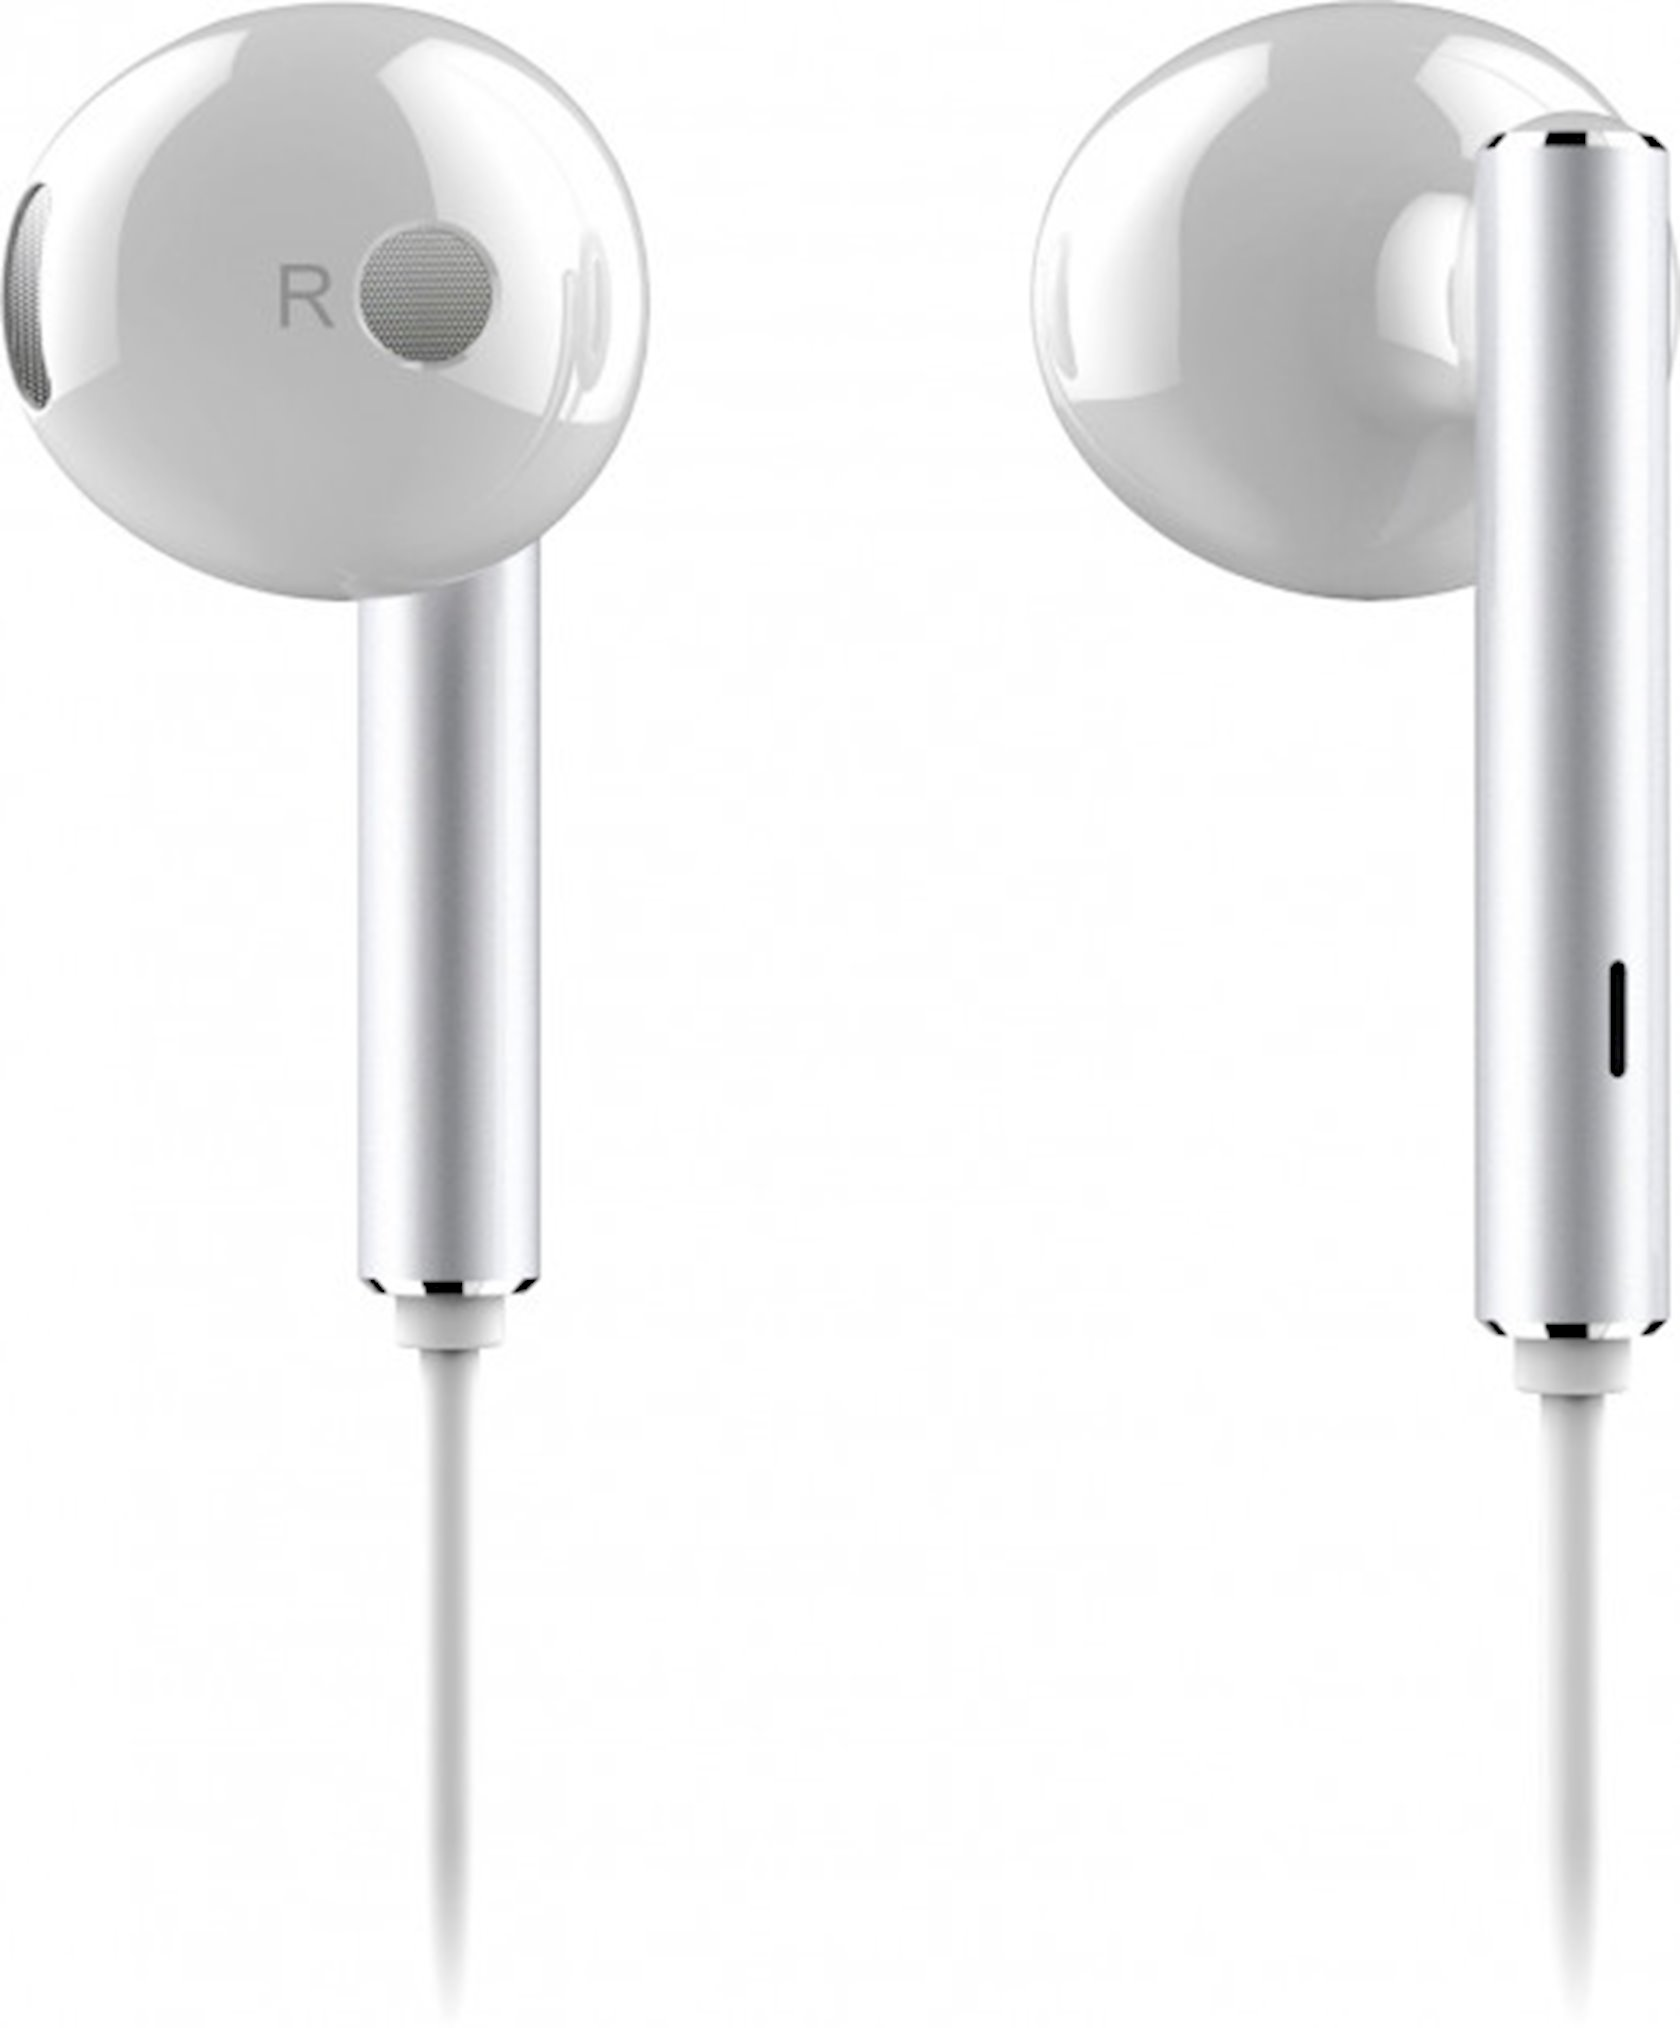 Simli qulaqlıqlar Huawei Half In-Ear Earphones AM116 White (22040281)